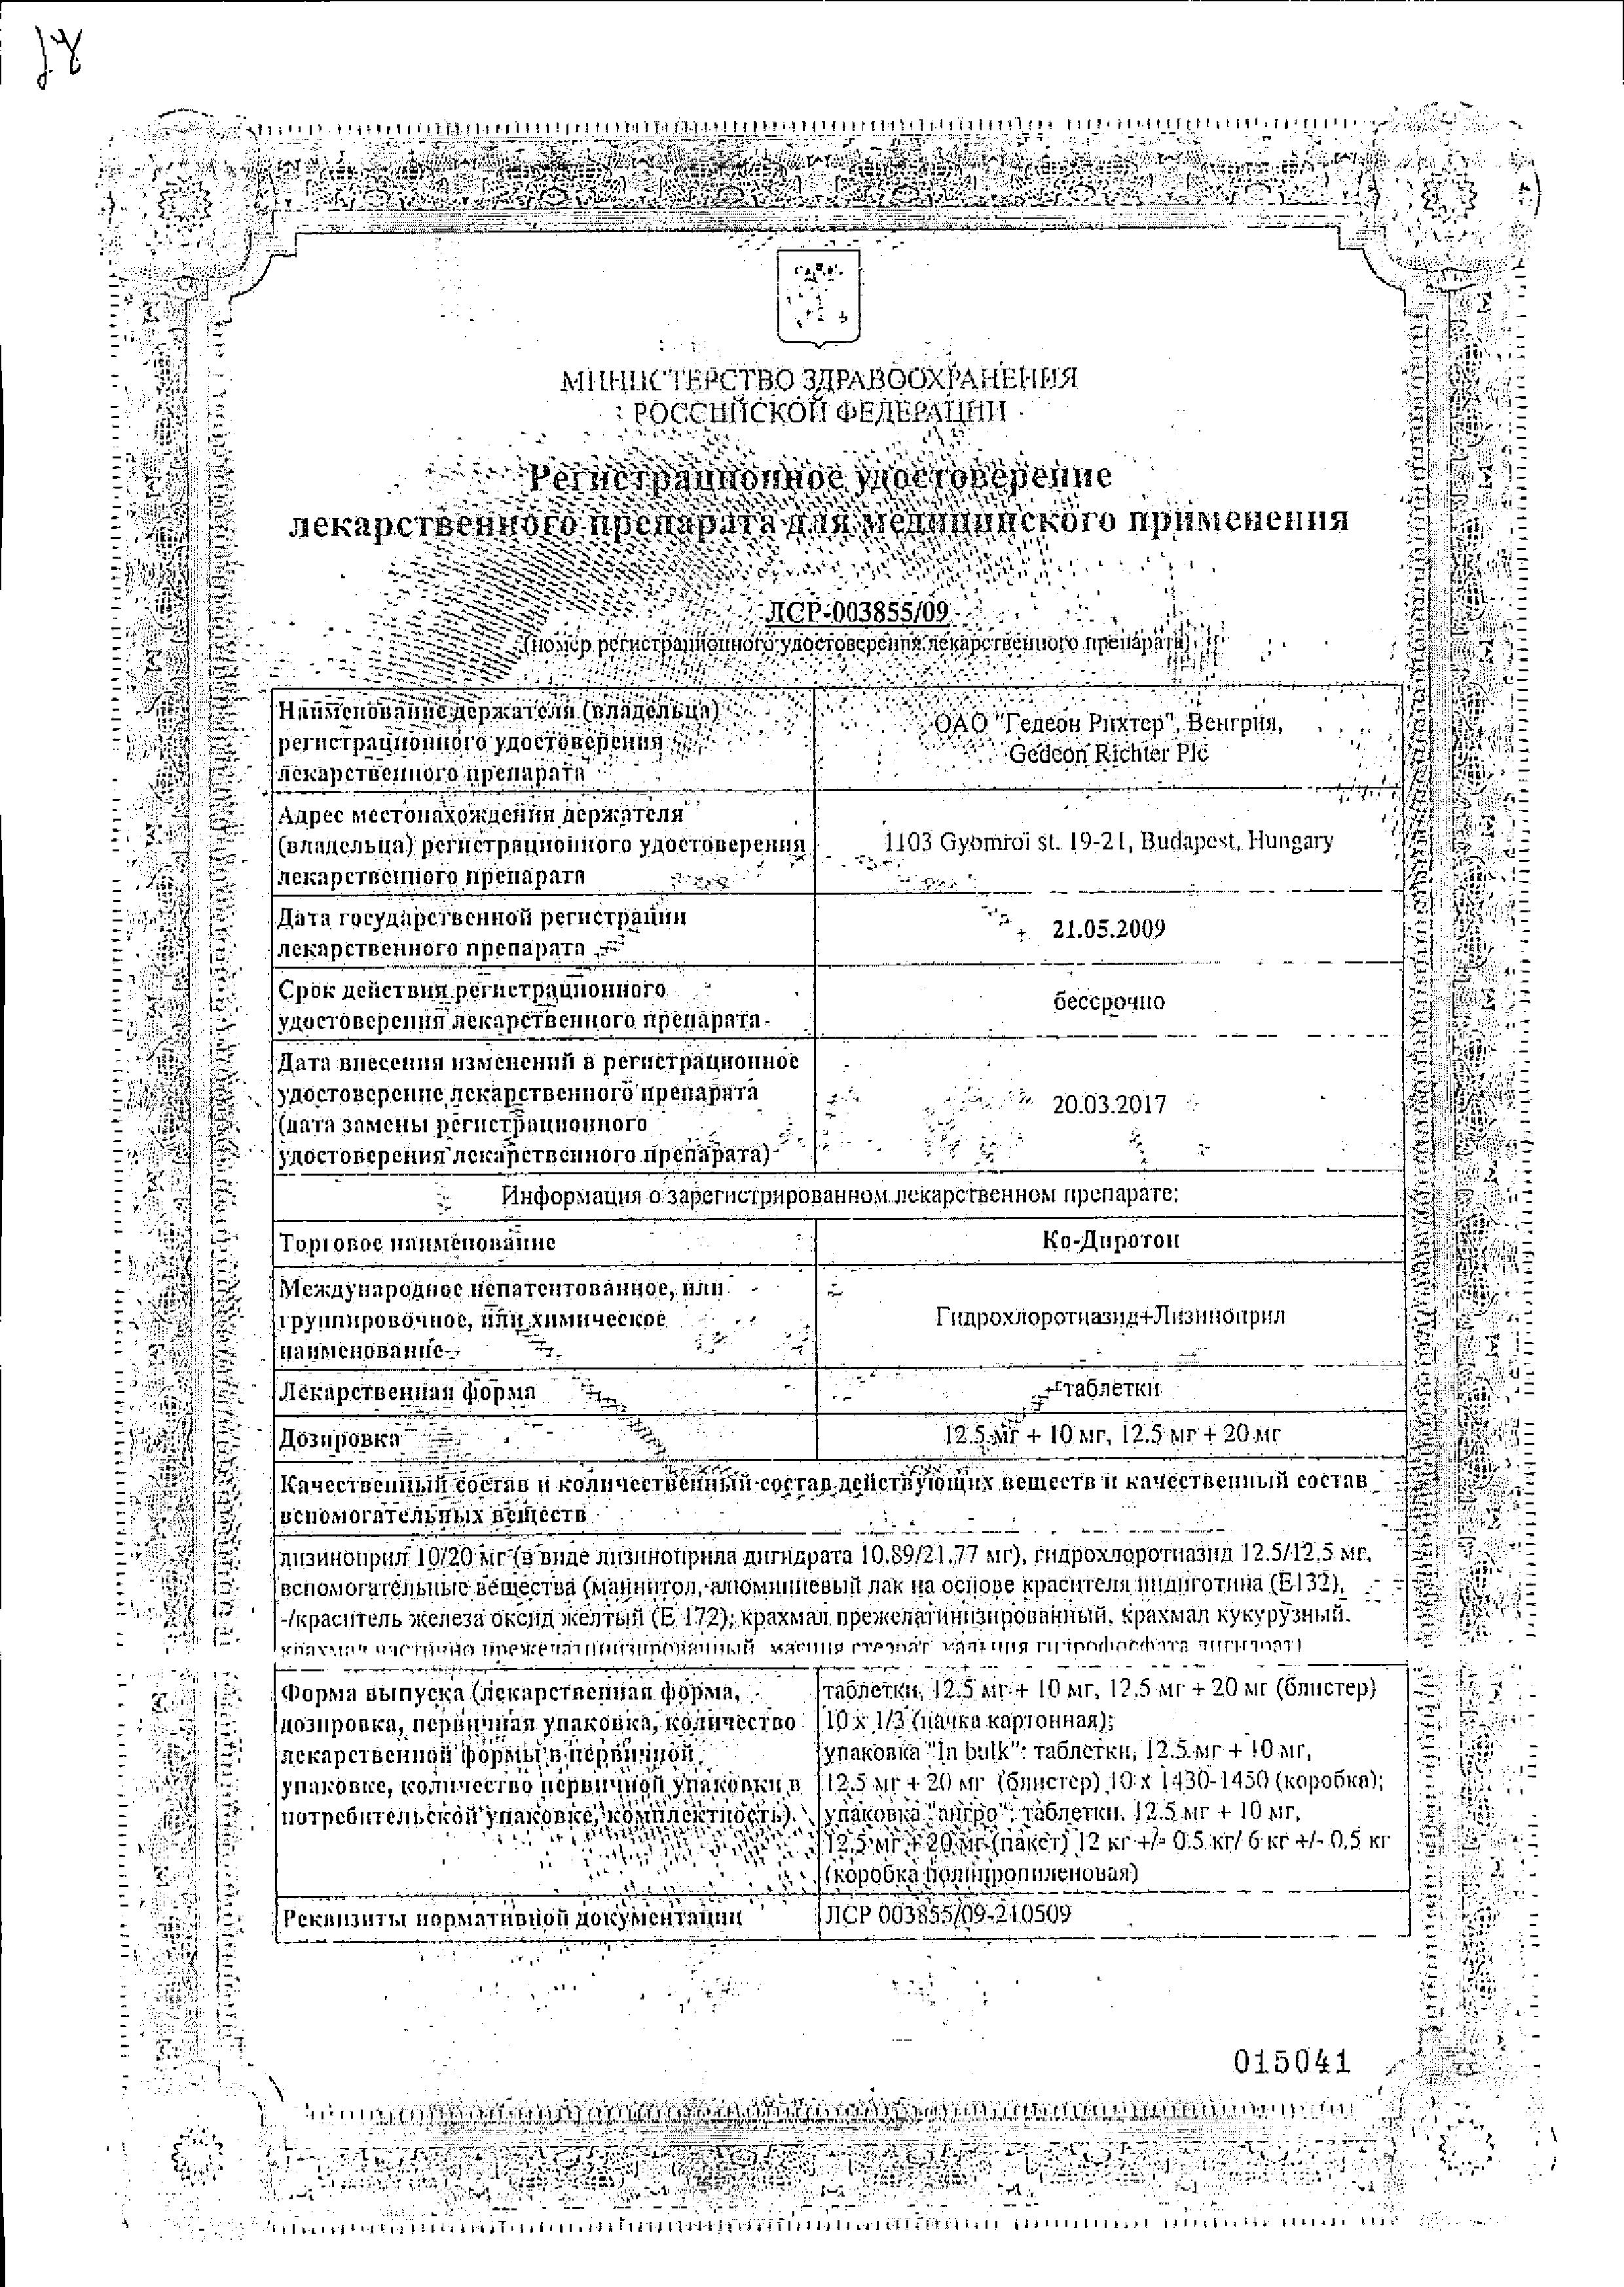 Ко-Диротон сертификат